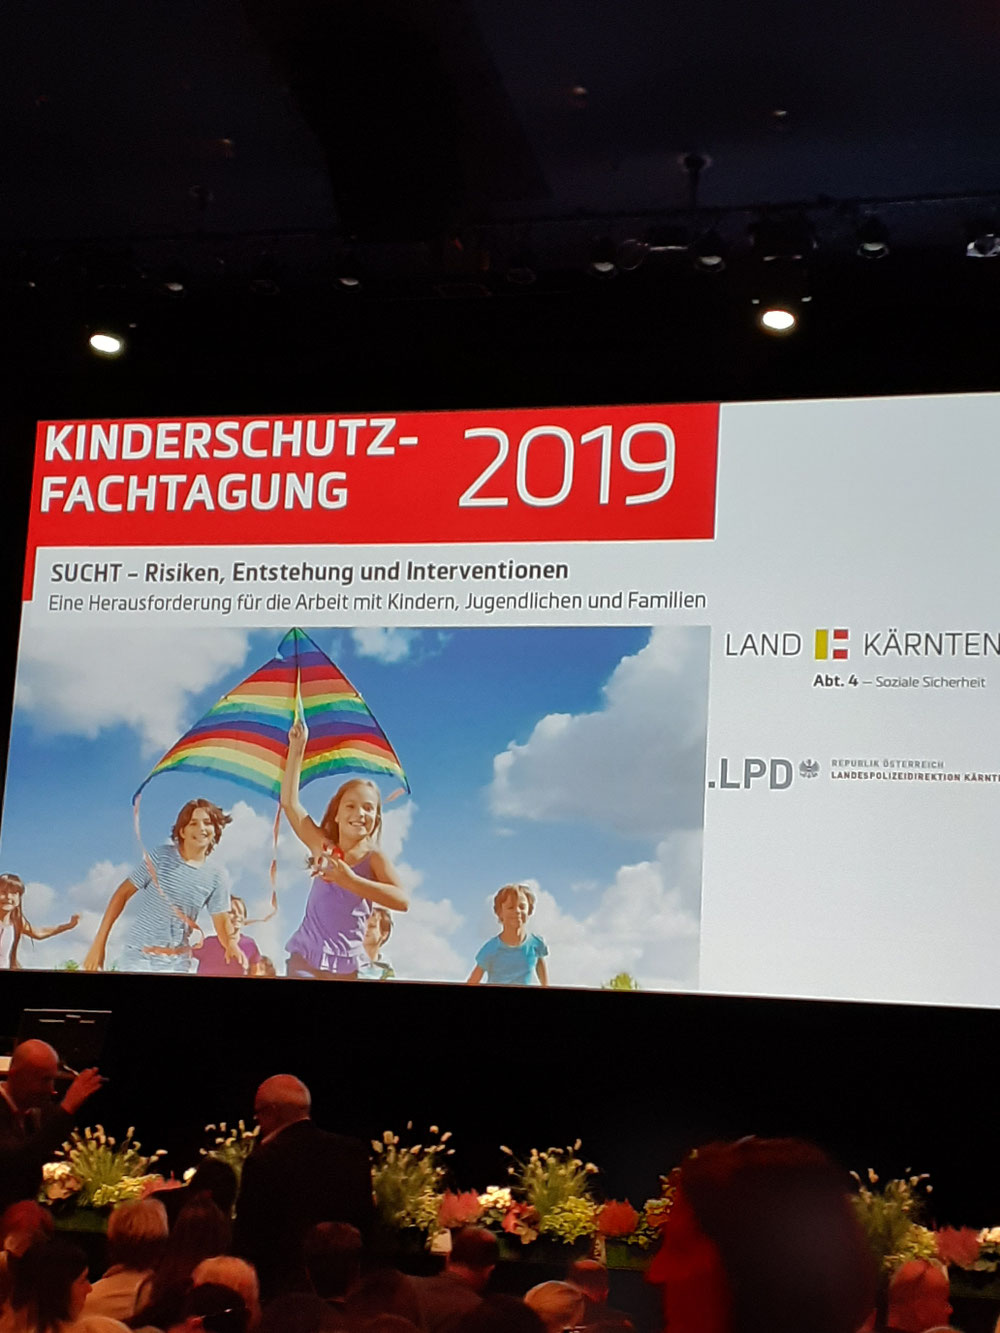 Kinderschutz Fachtagung 2019 Villach